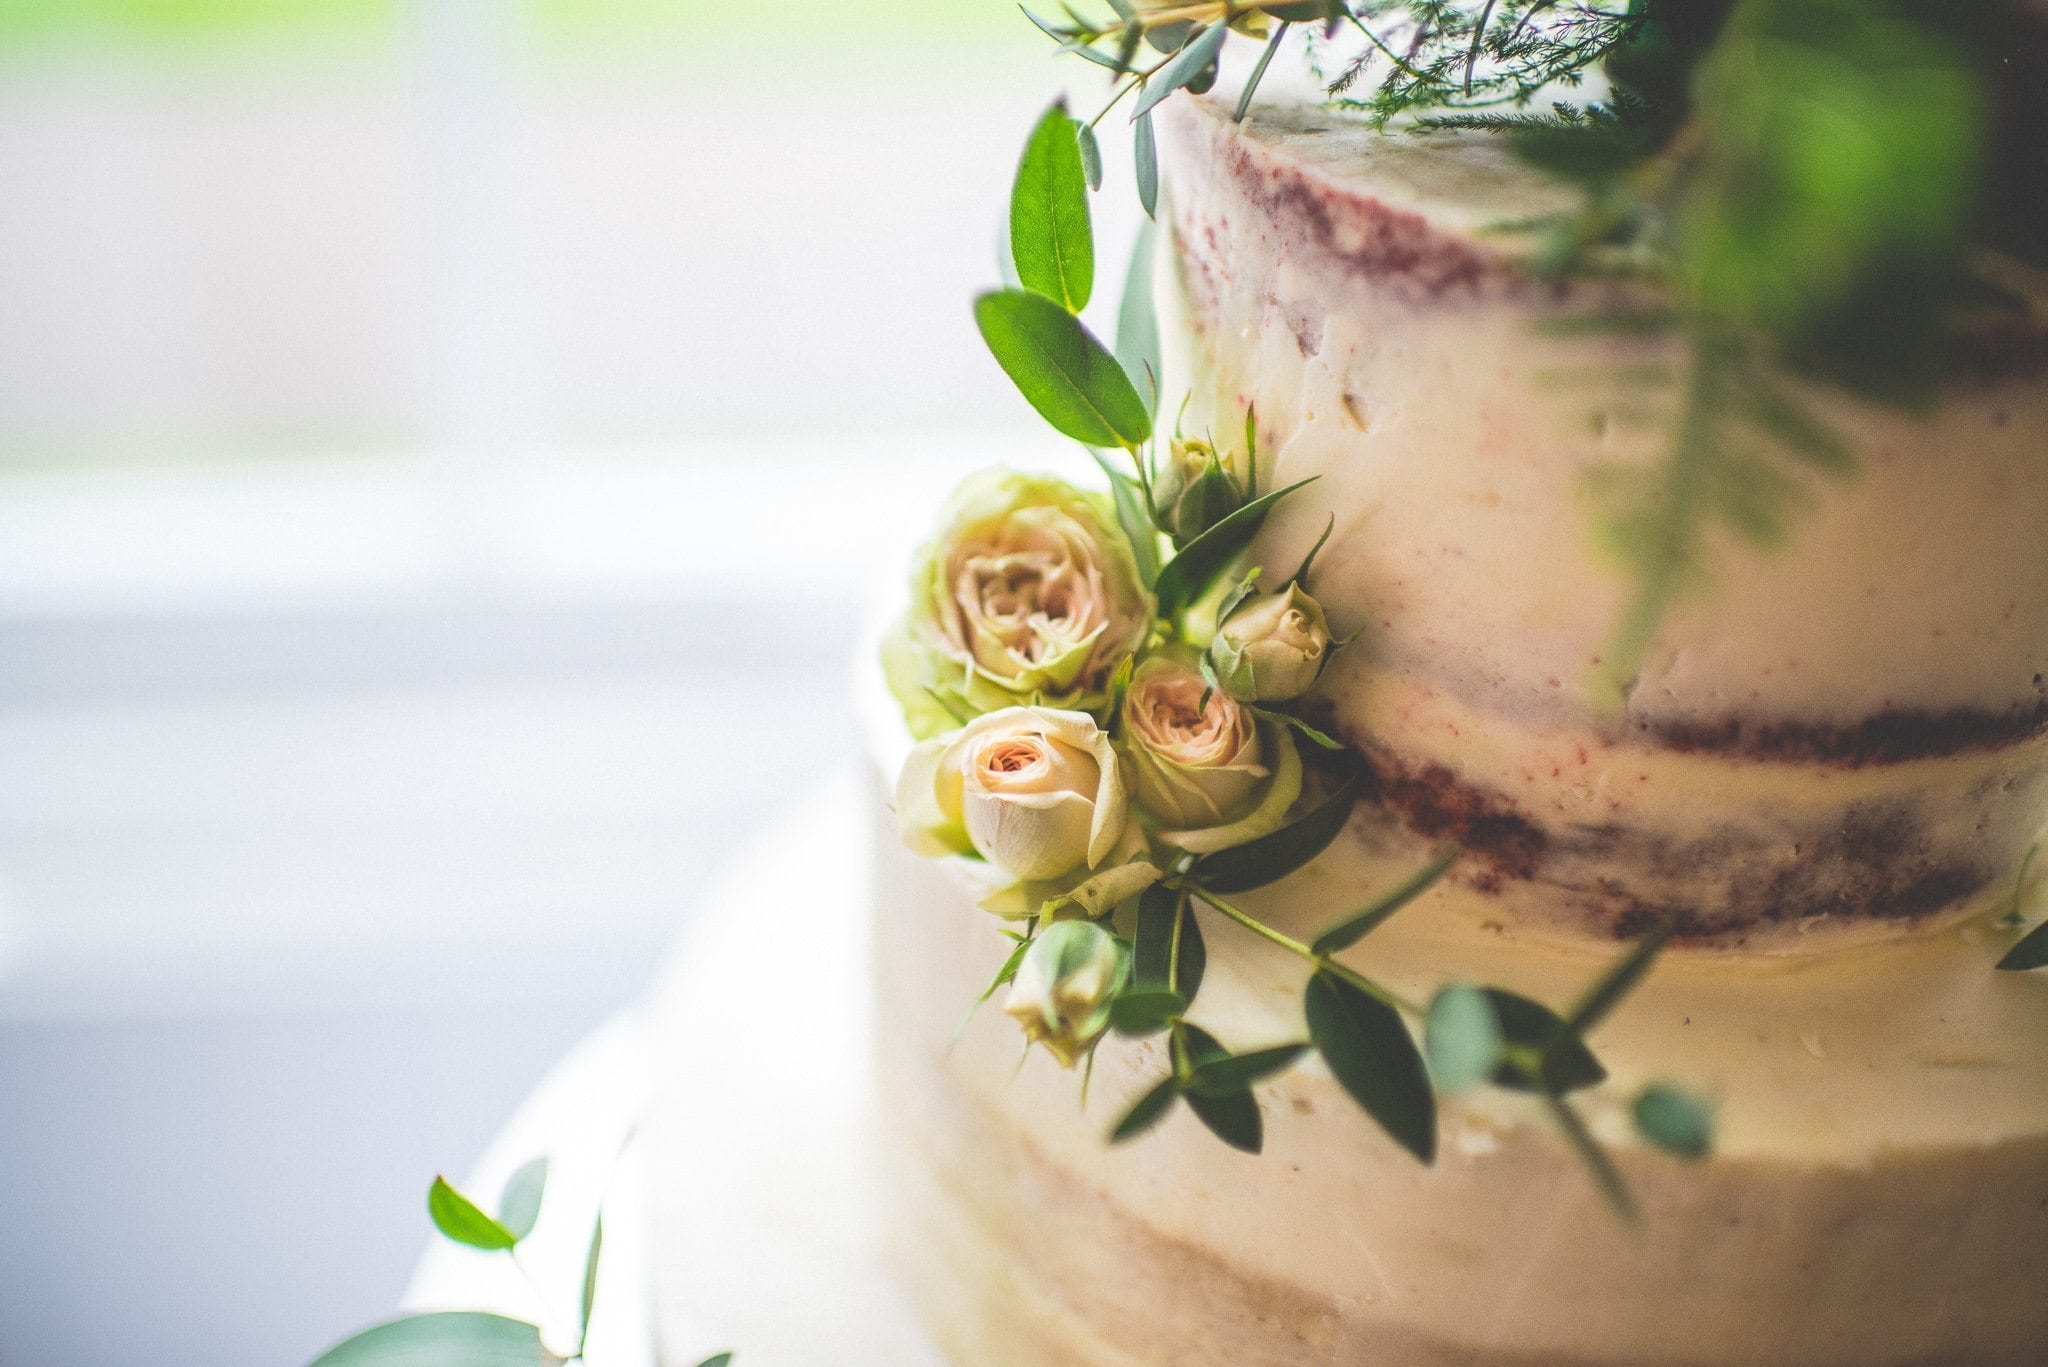 A close up of the rosebuds adorning the cake